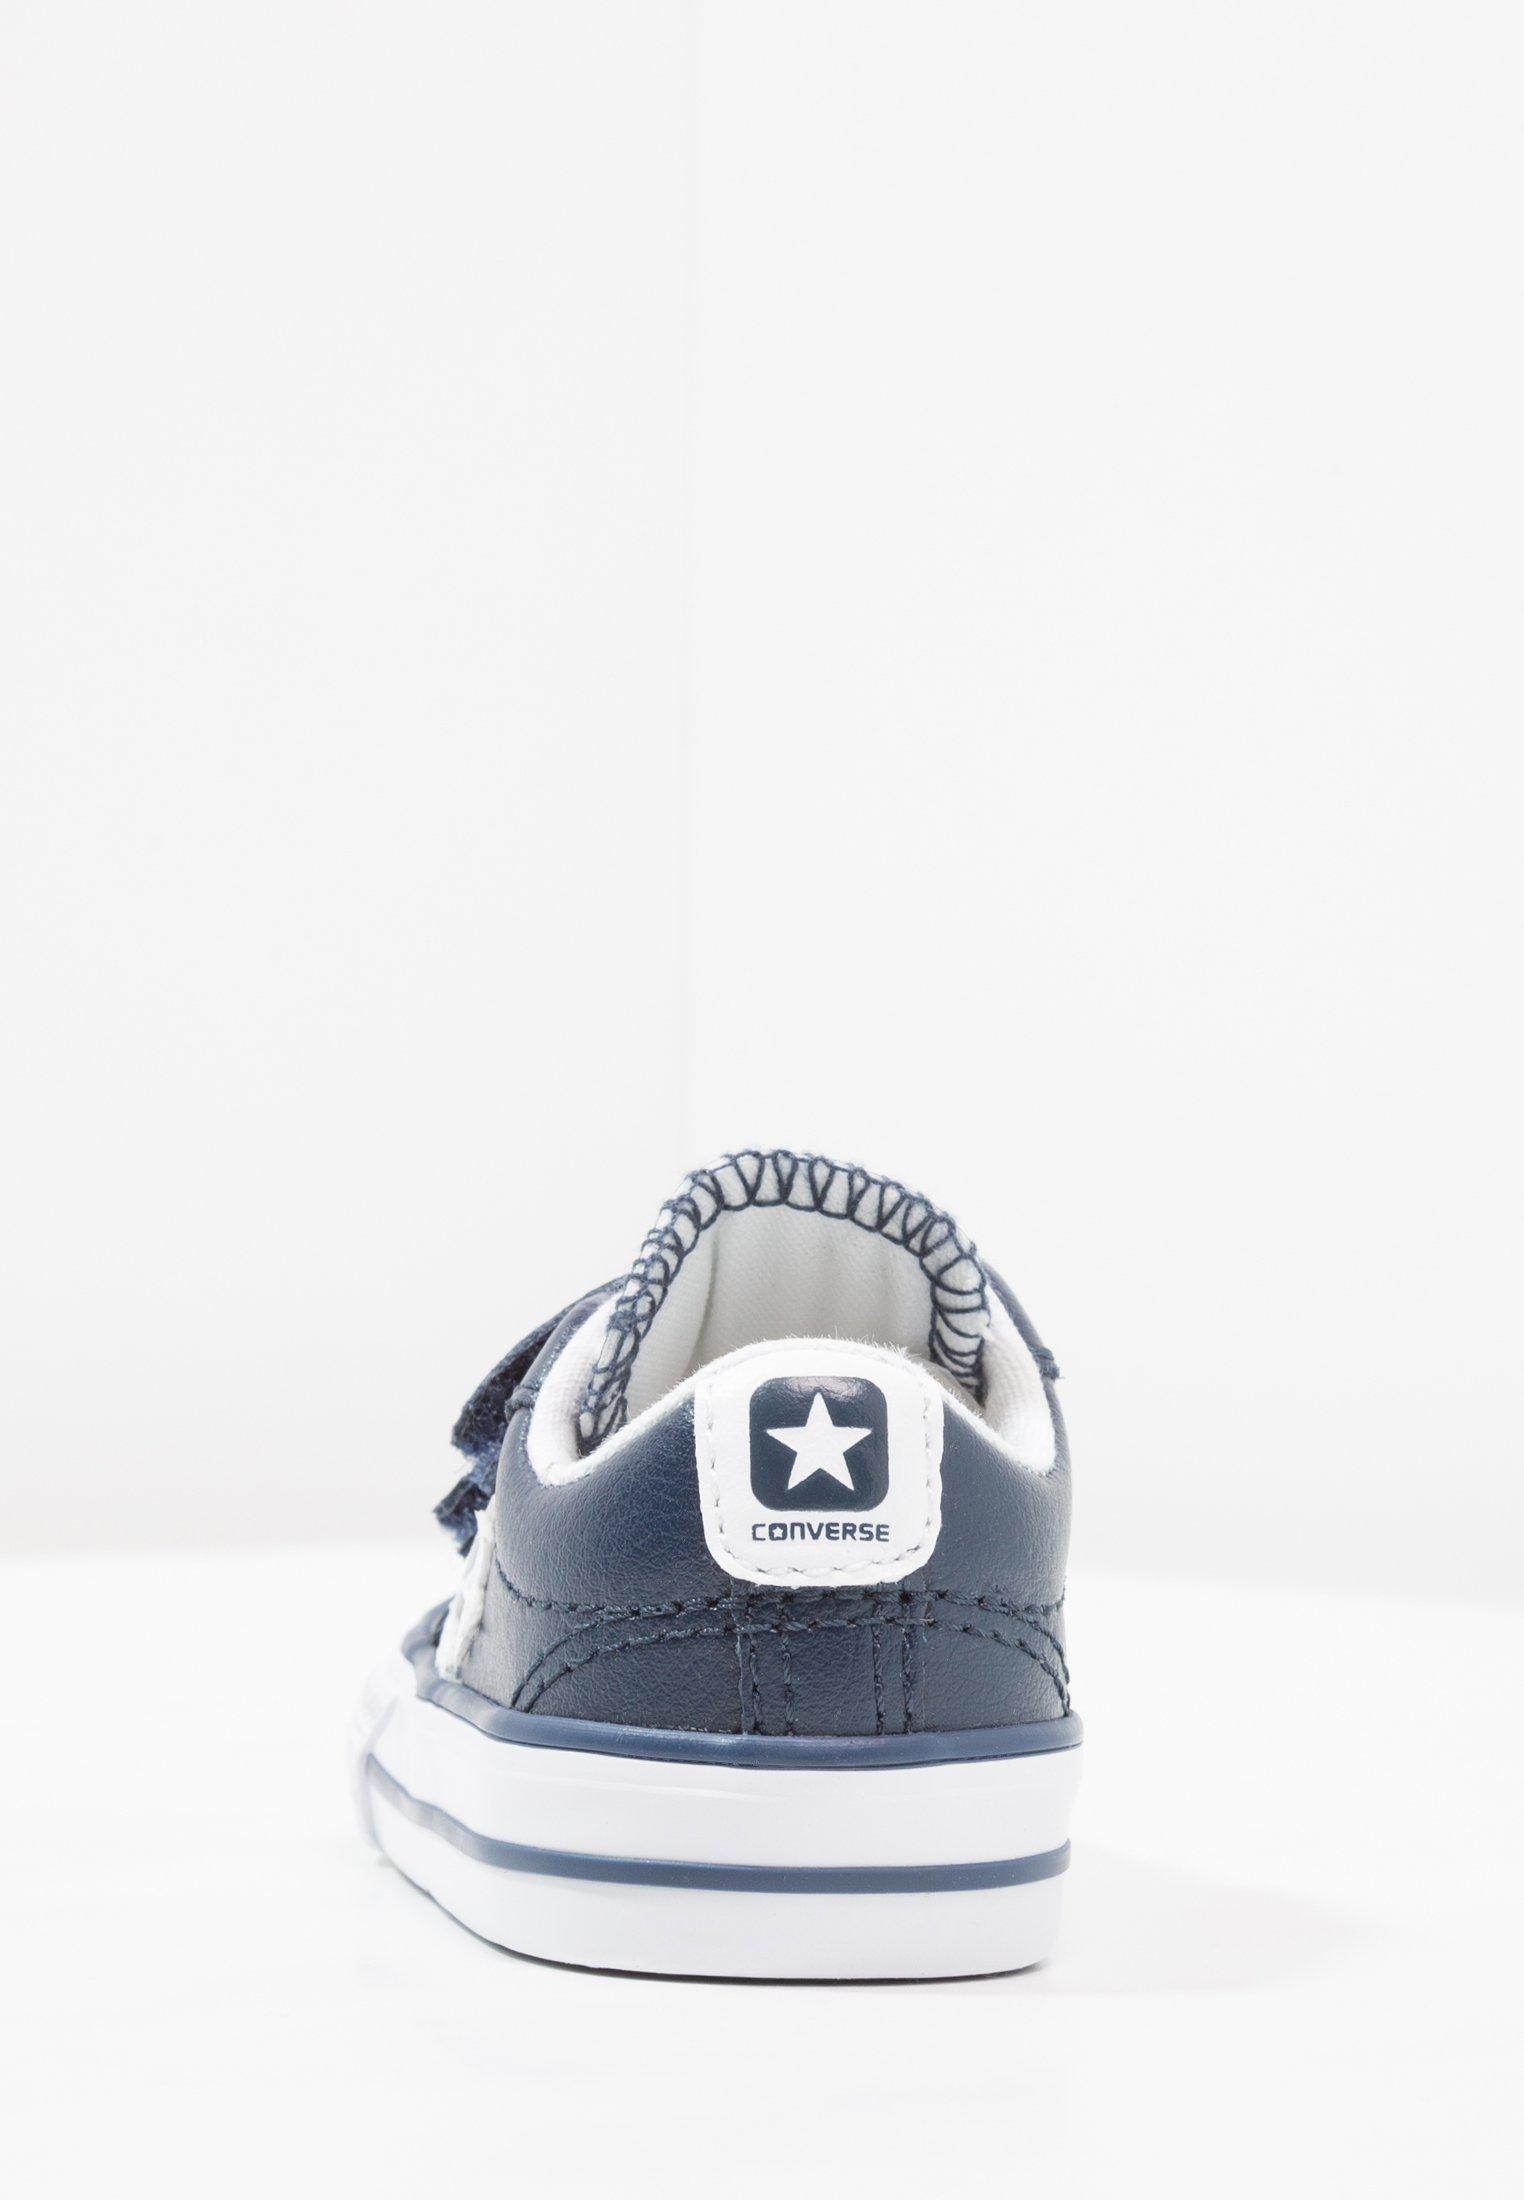 Converse STAR PLAYER INFANT - Scarpe primi passi - navy/white/blu ...